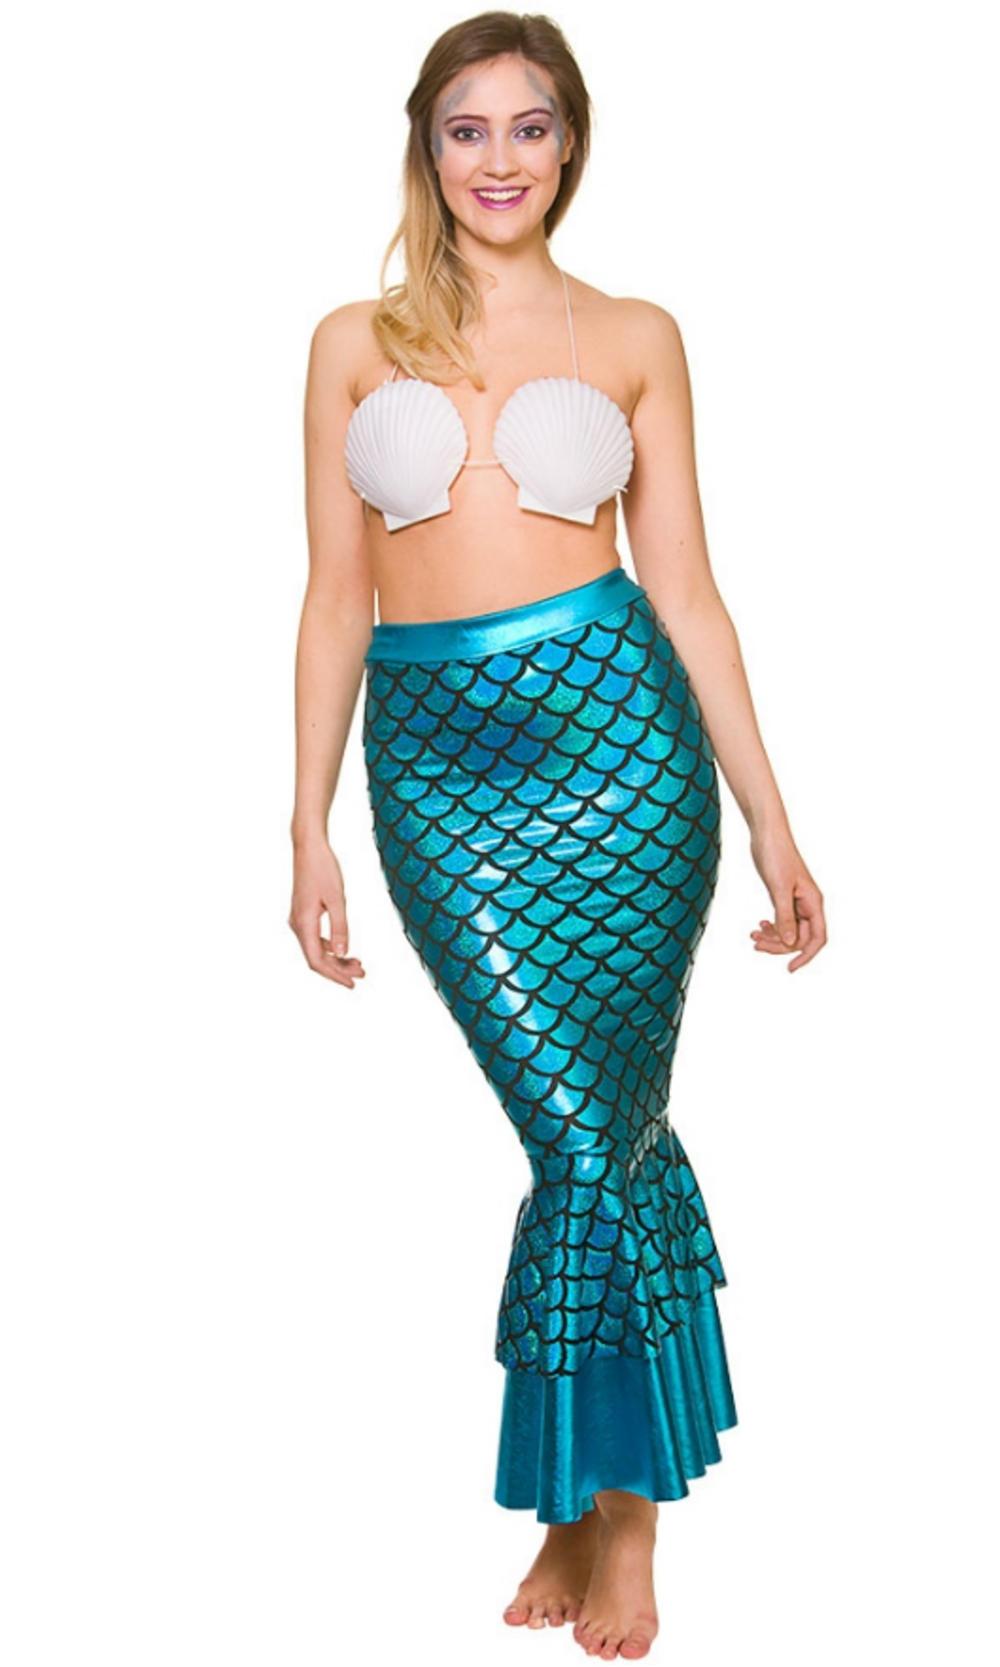 Mermaid Skirt Ladies Accessory